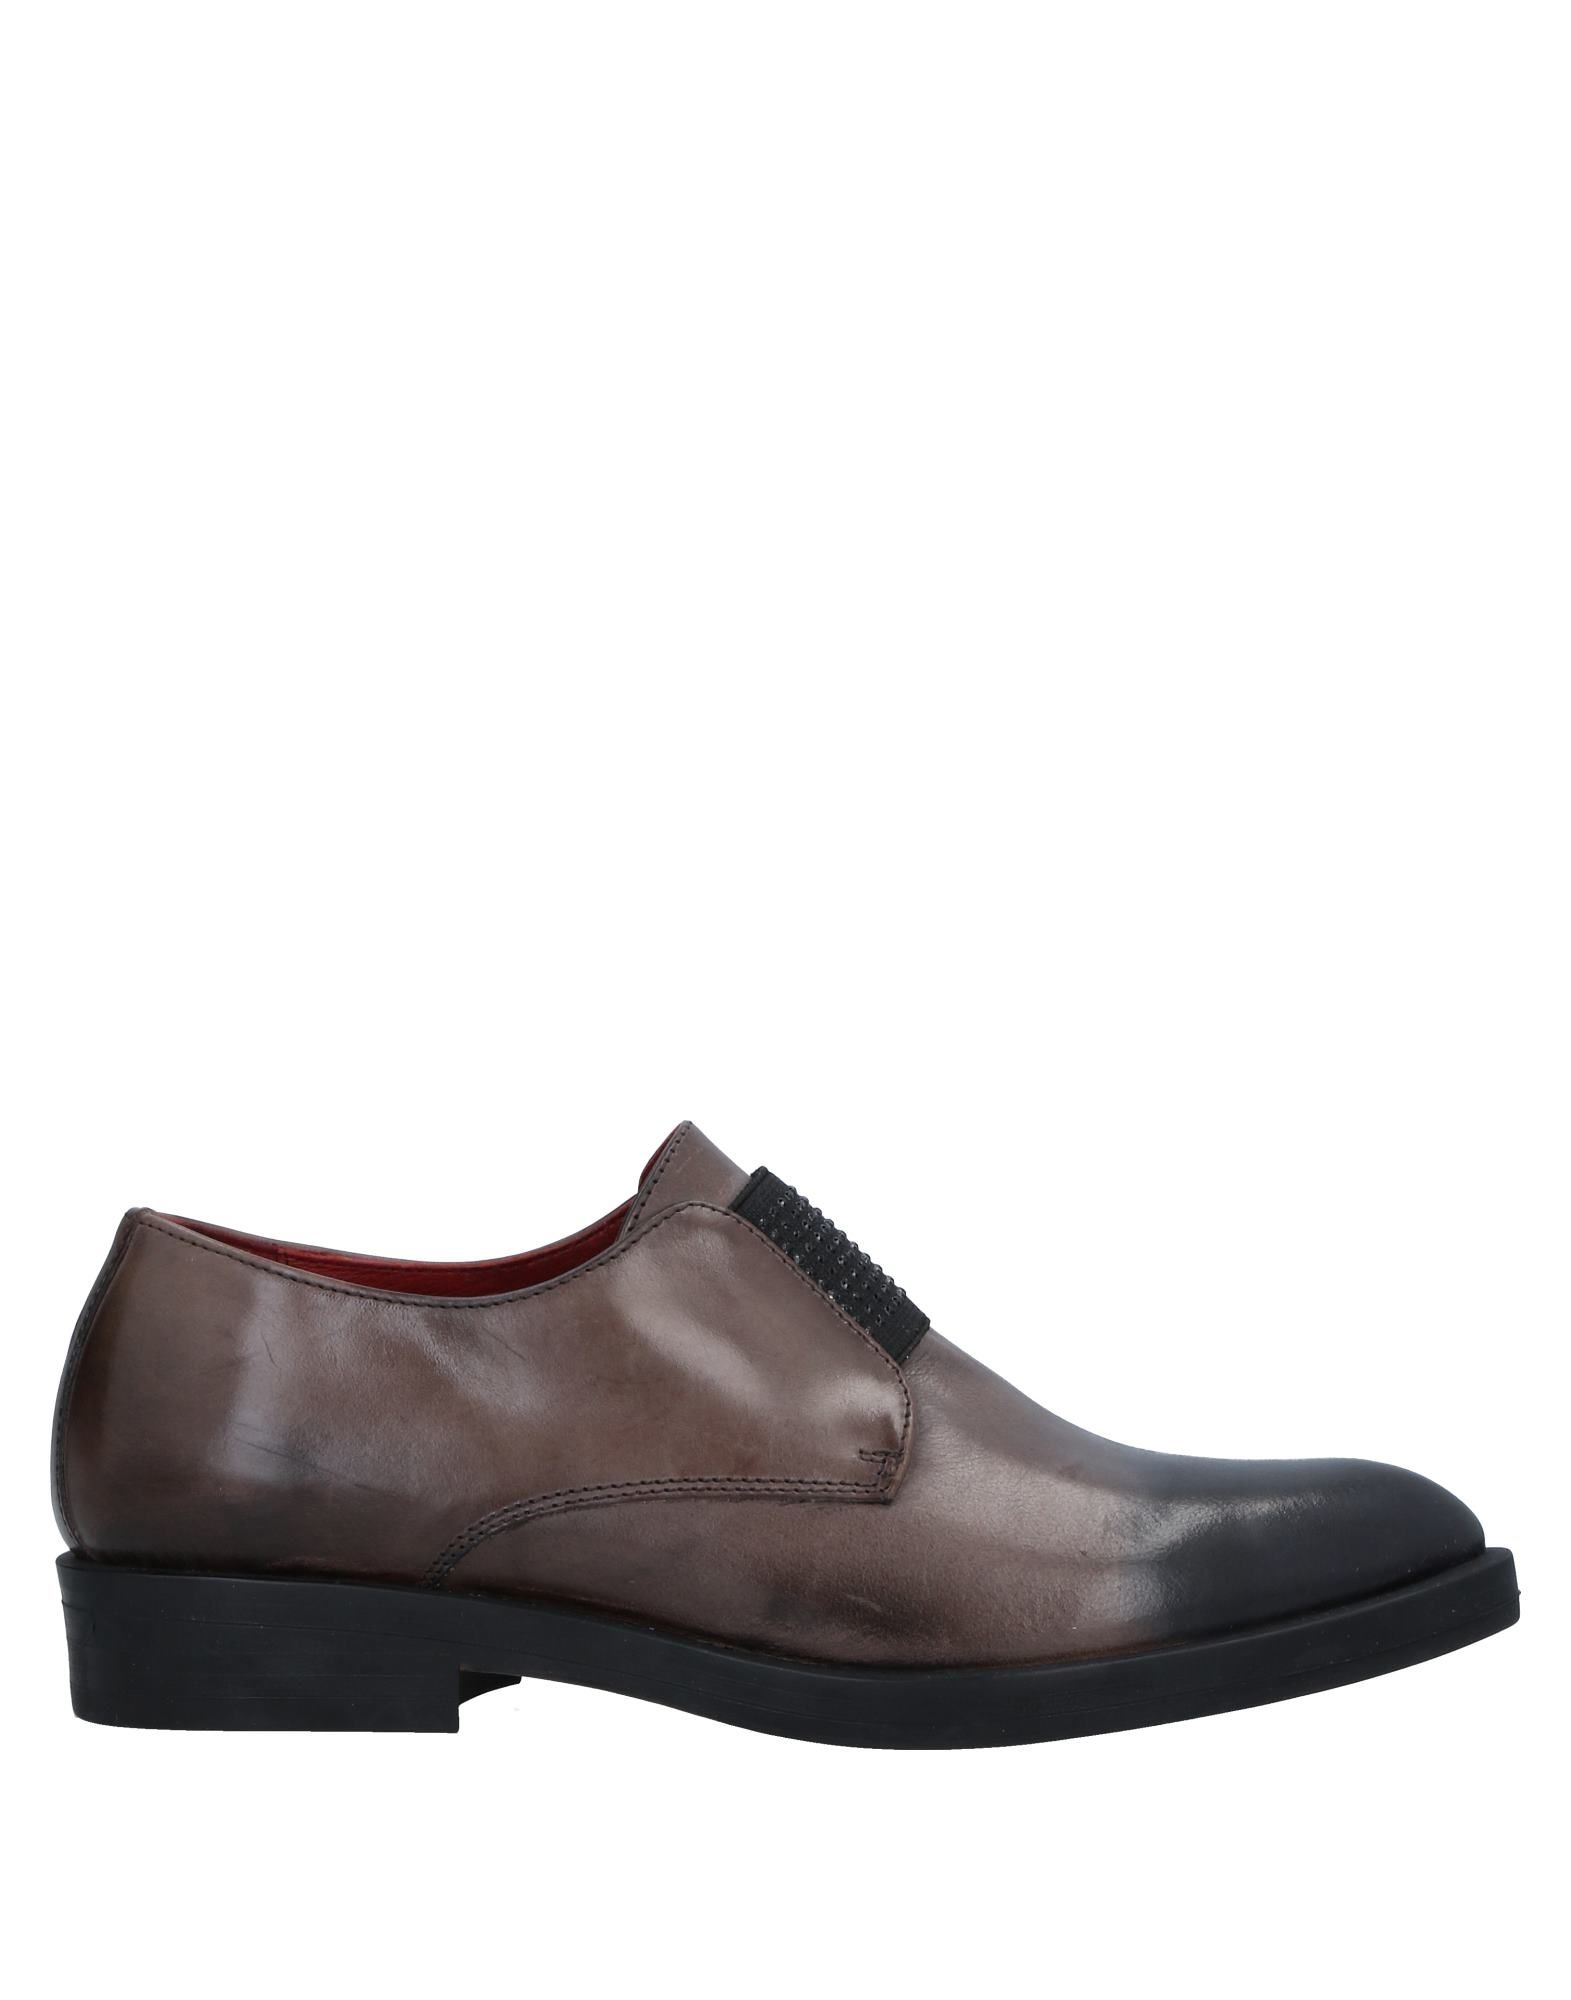 Angela George Mokassins Damen  11534076OD Gute Qualität beliebte Schuhe